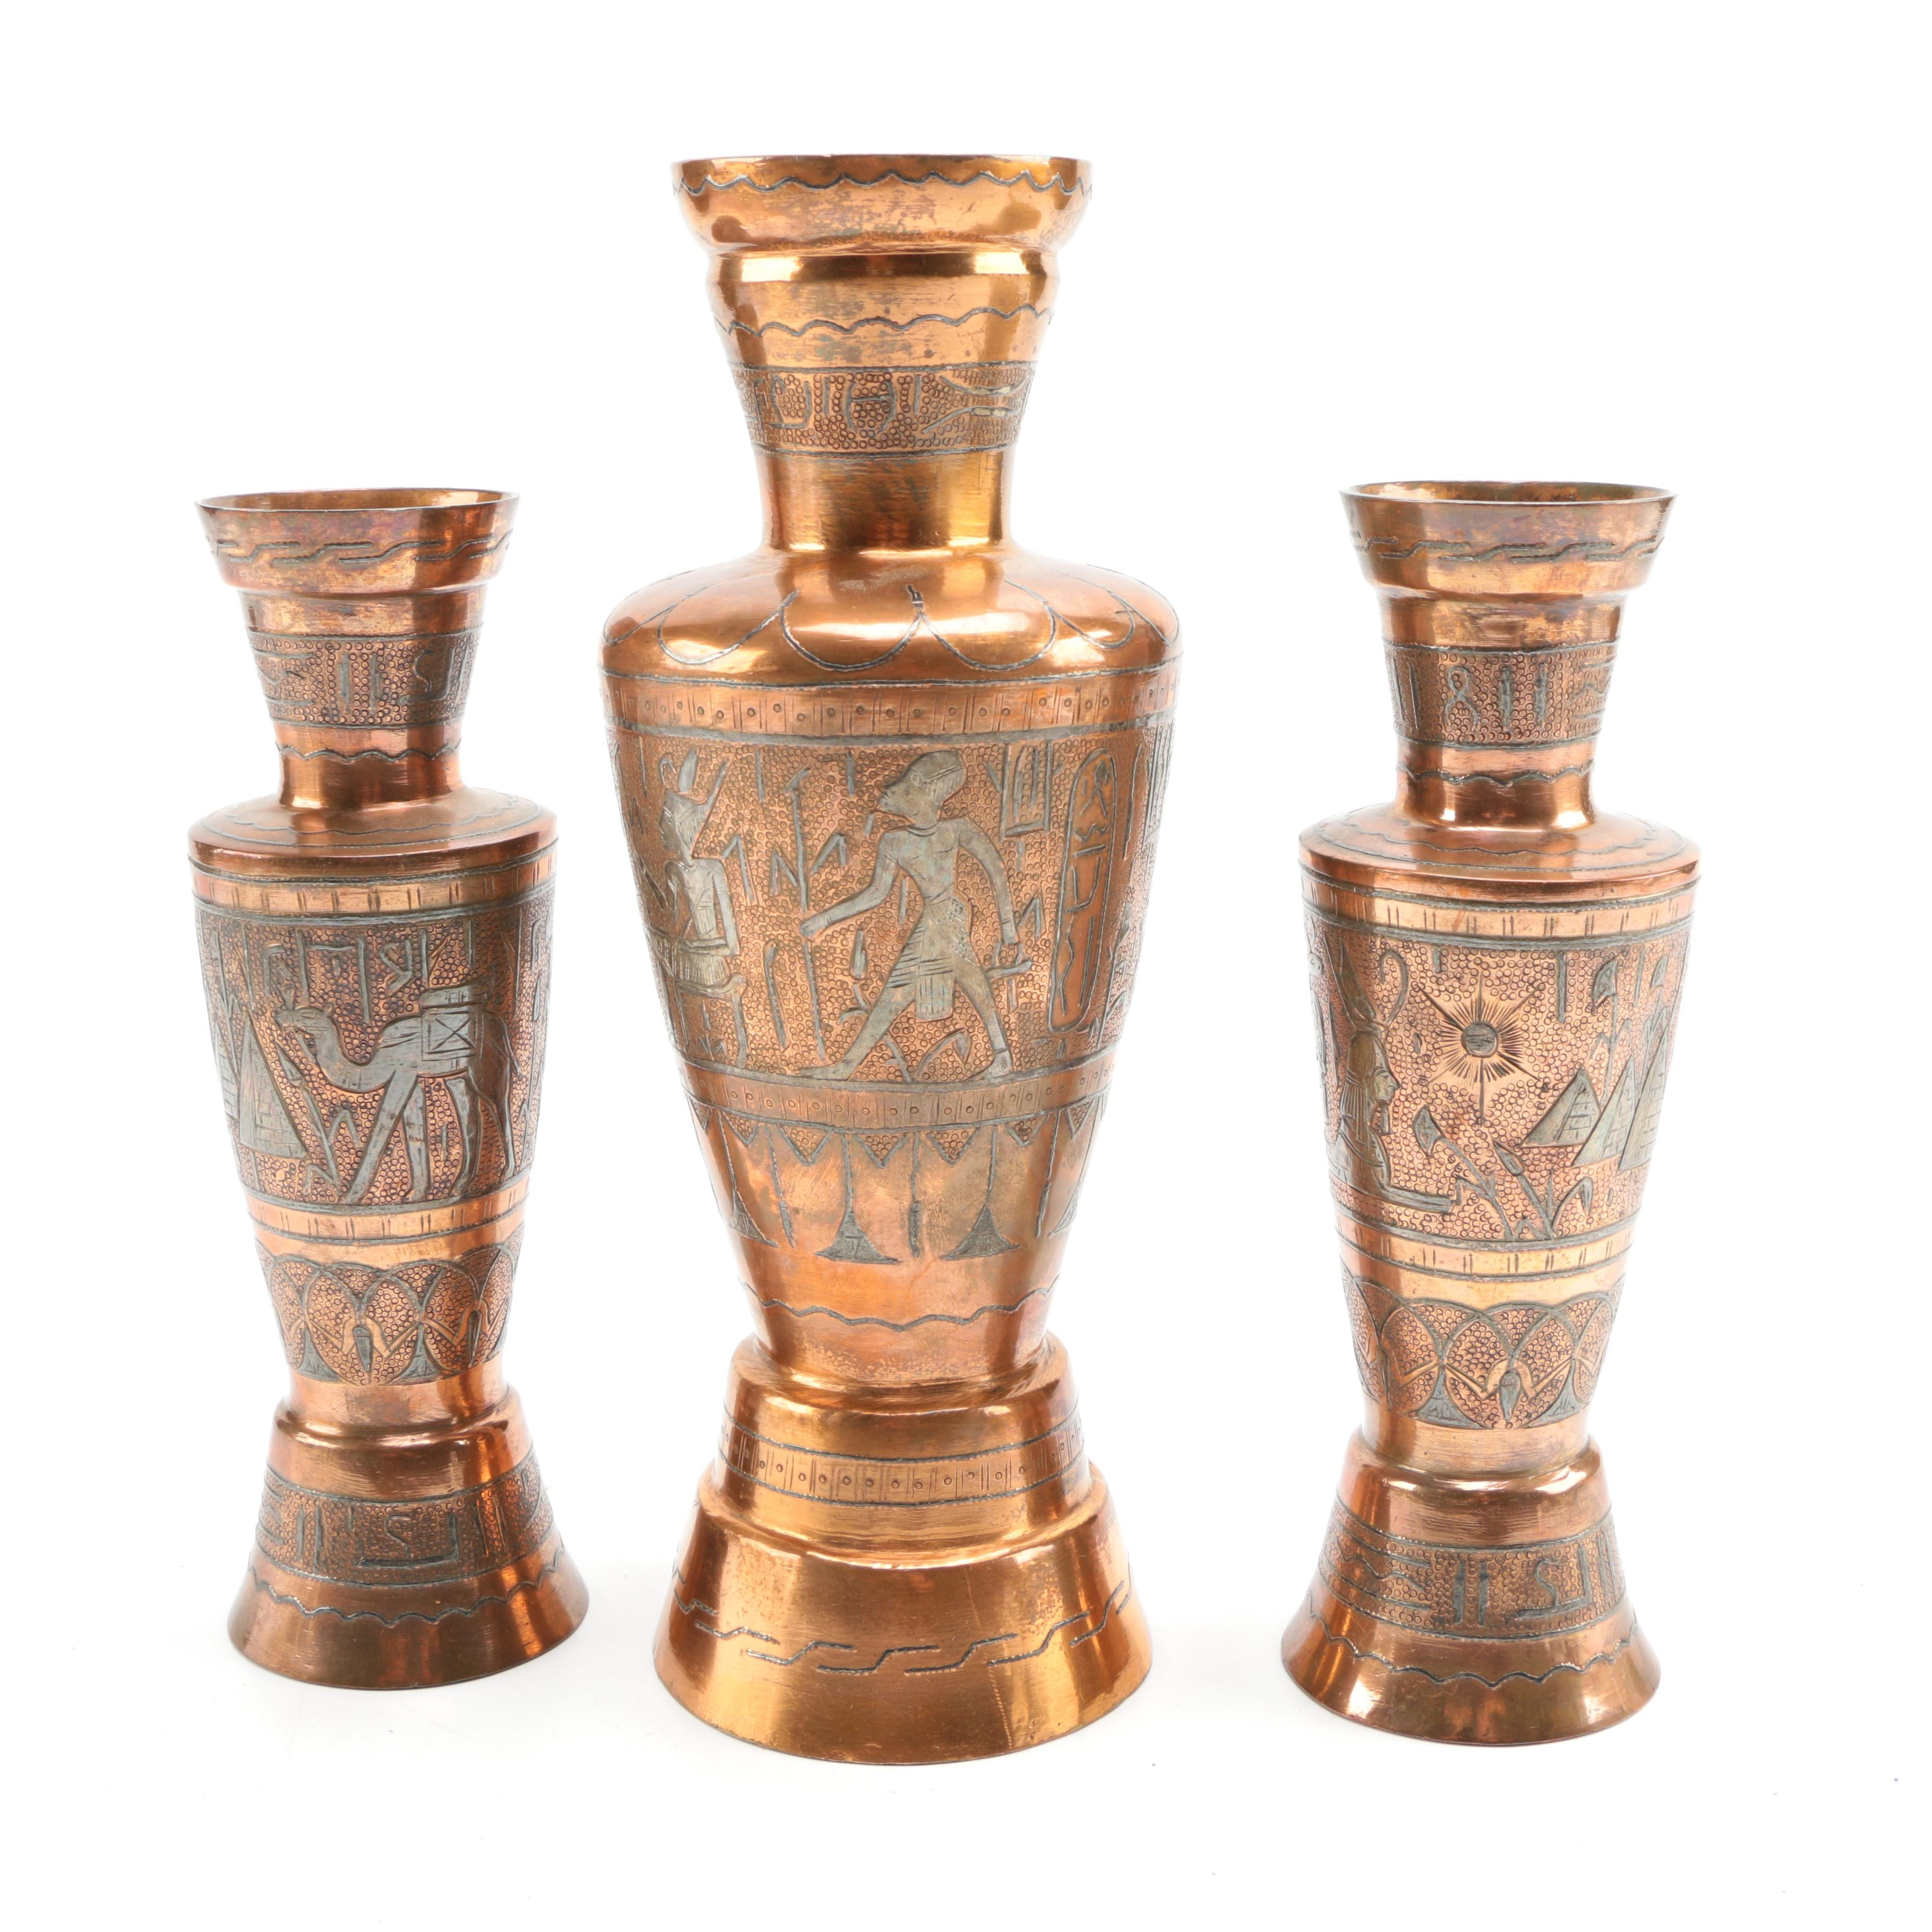 Egyptian-Inspired Copper Plated Garniture Set